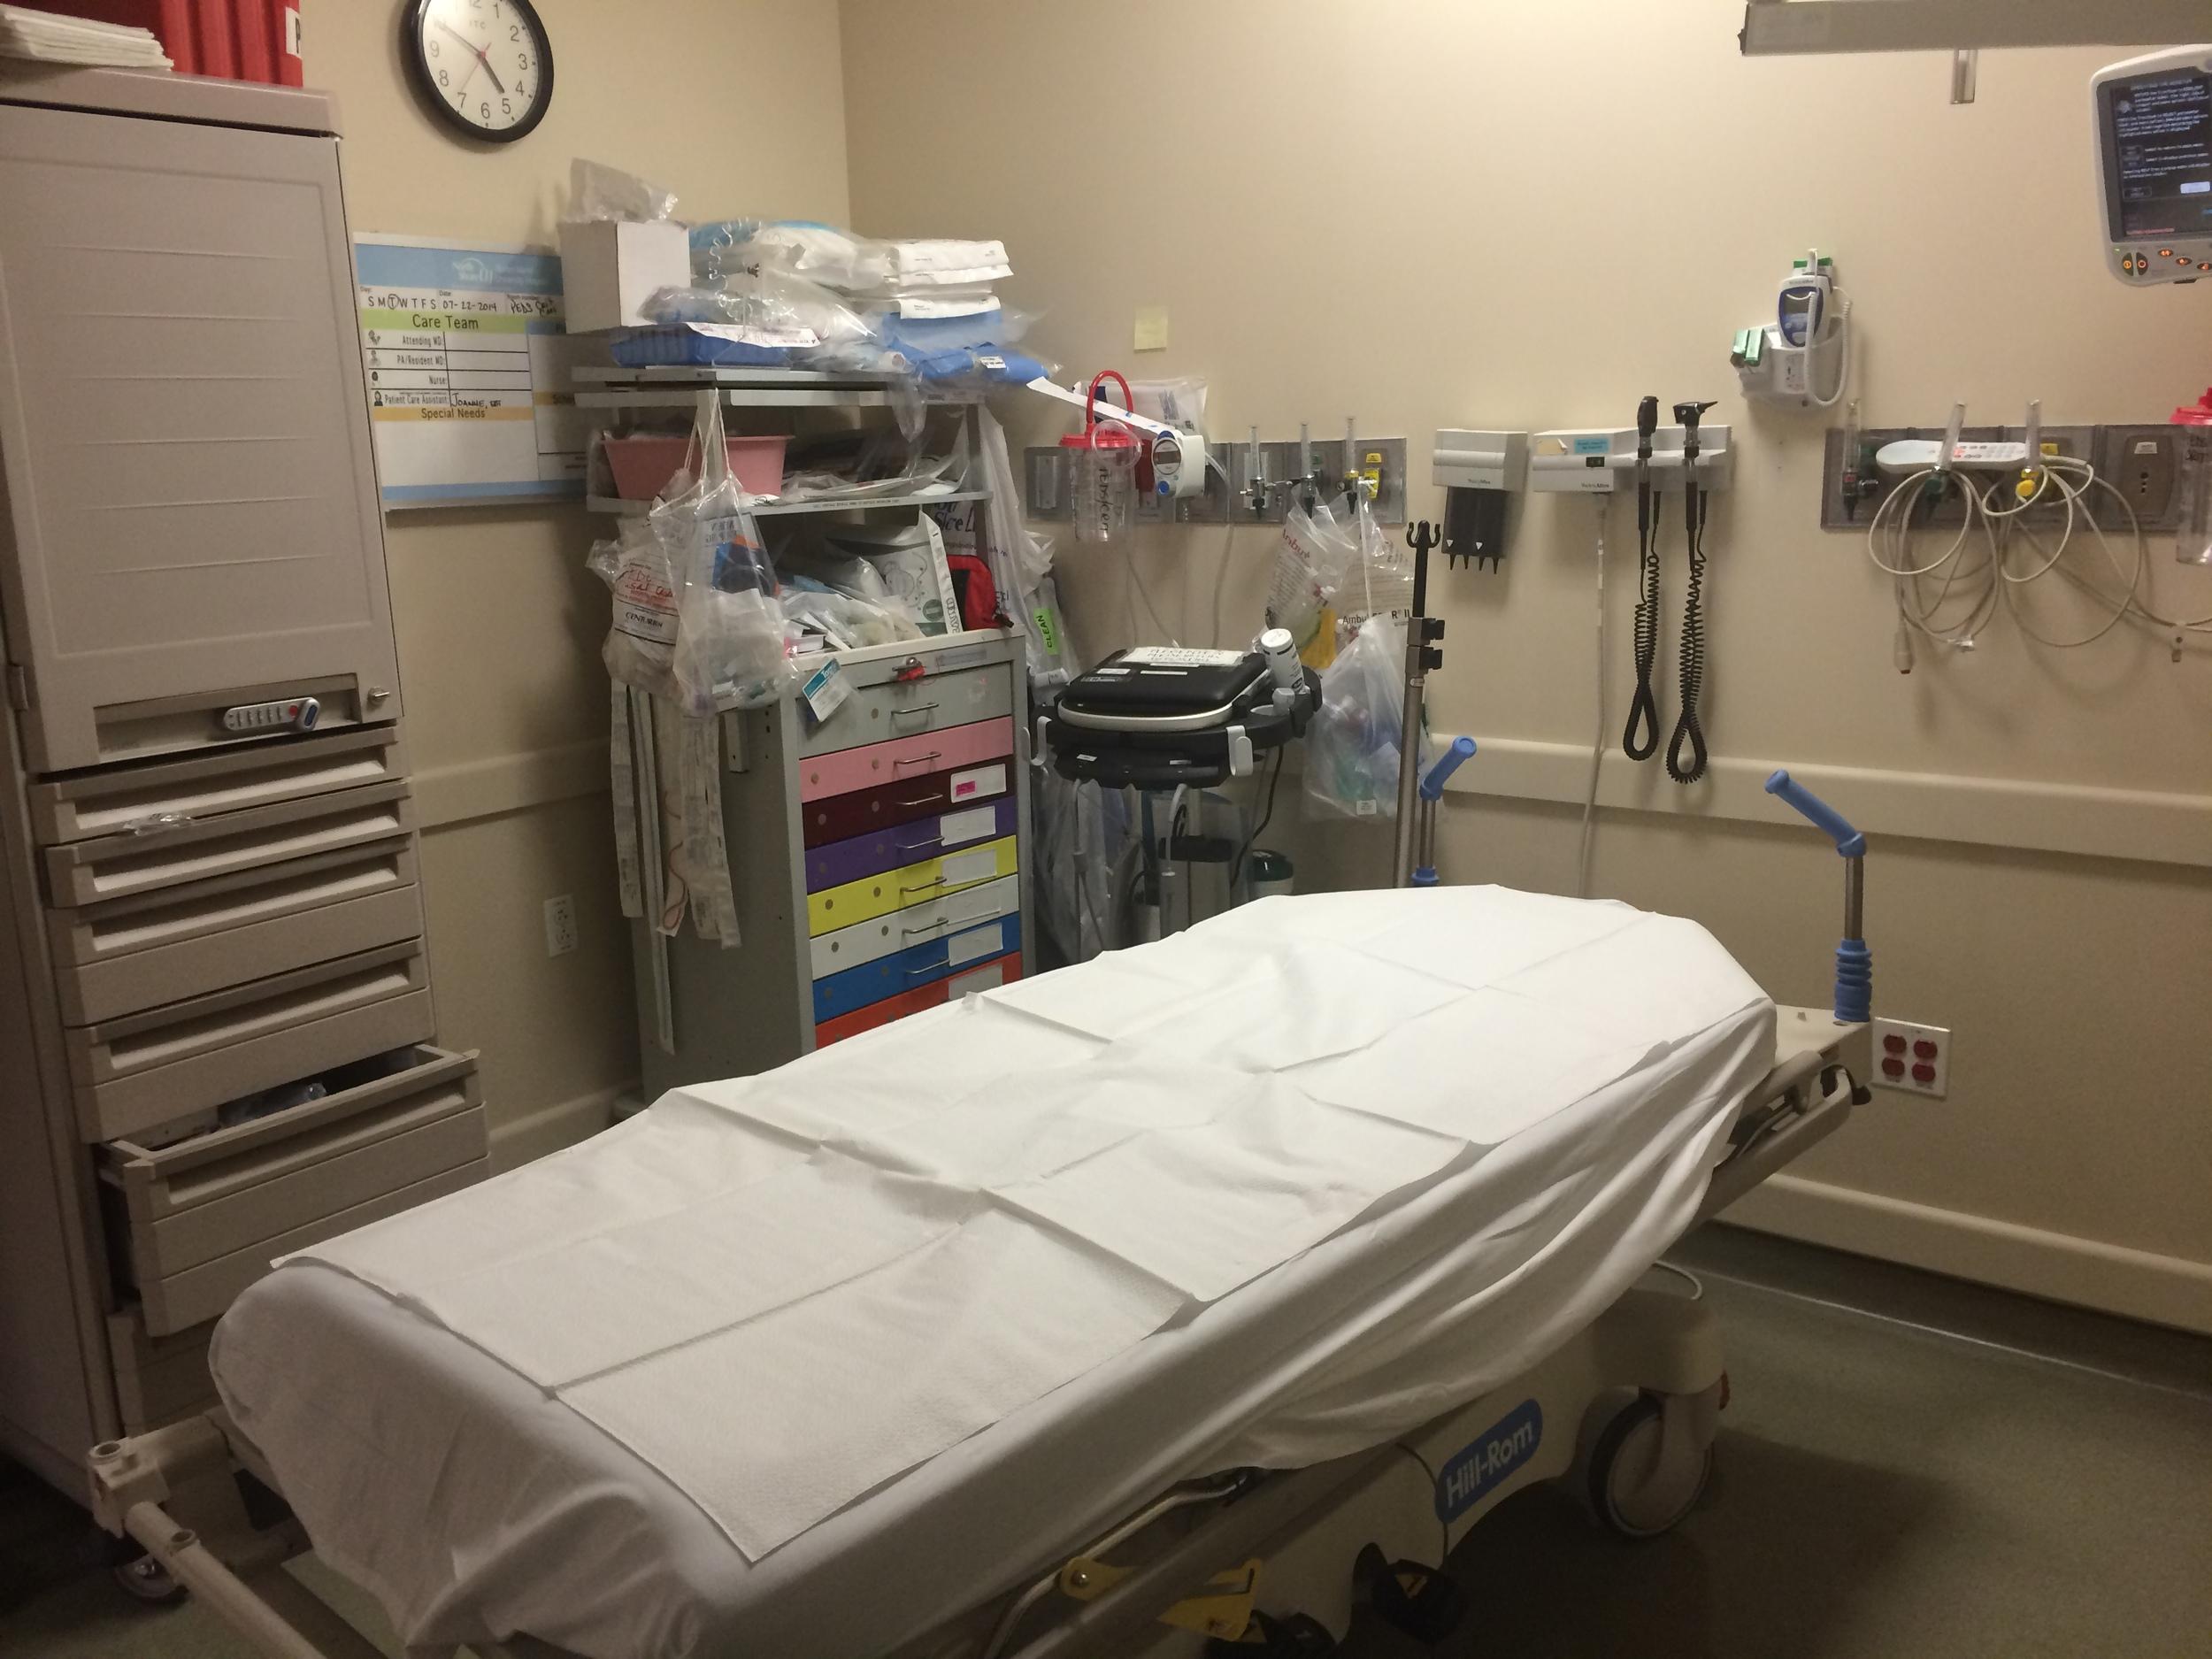 Our pediatric critical care room